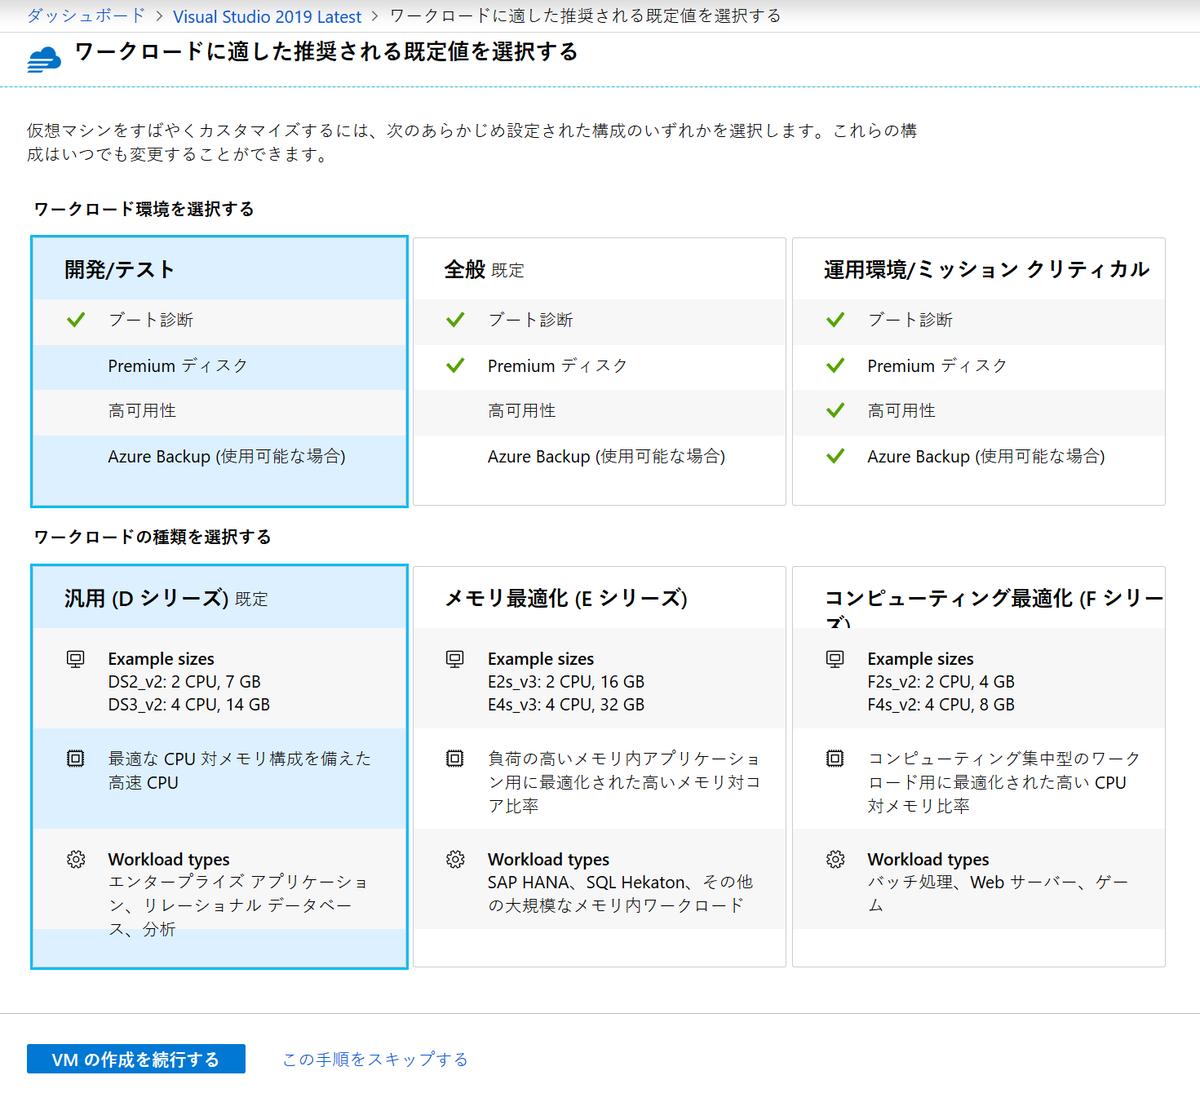 f:id:tech-tsubaki:20190928215439p:plain